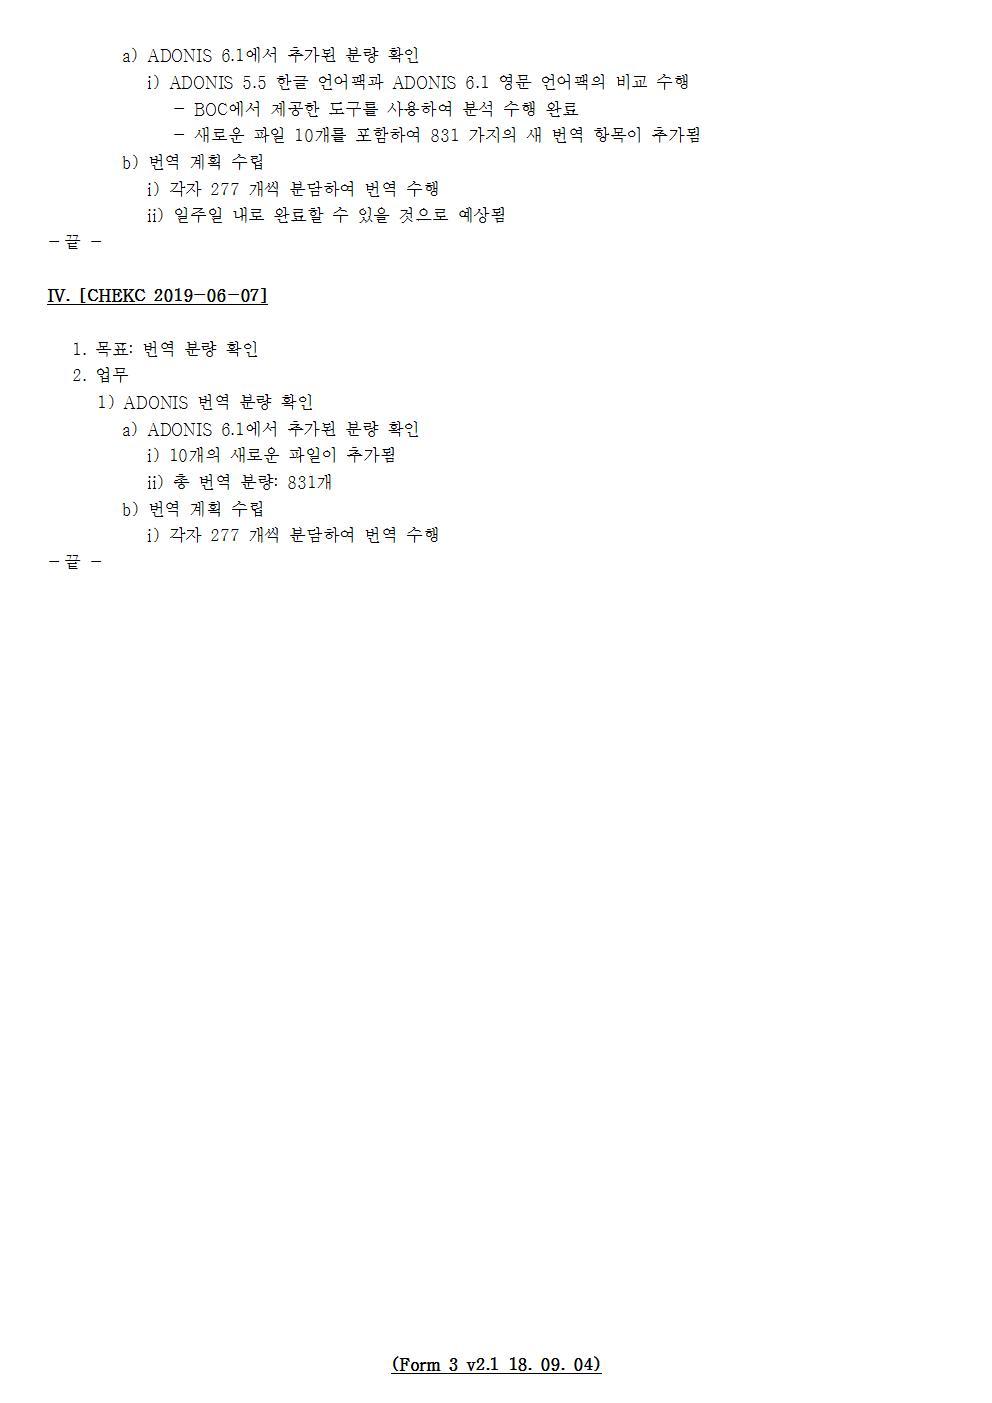 D-[19-033-BZ-05]-[ADONIS Translation]-[2019-06-07][YB]-[19-6-1]-[P+D+C]002.jpg